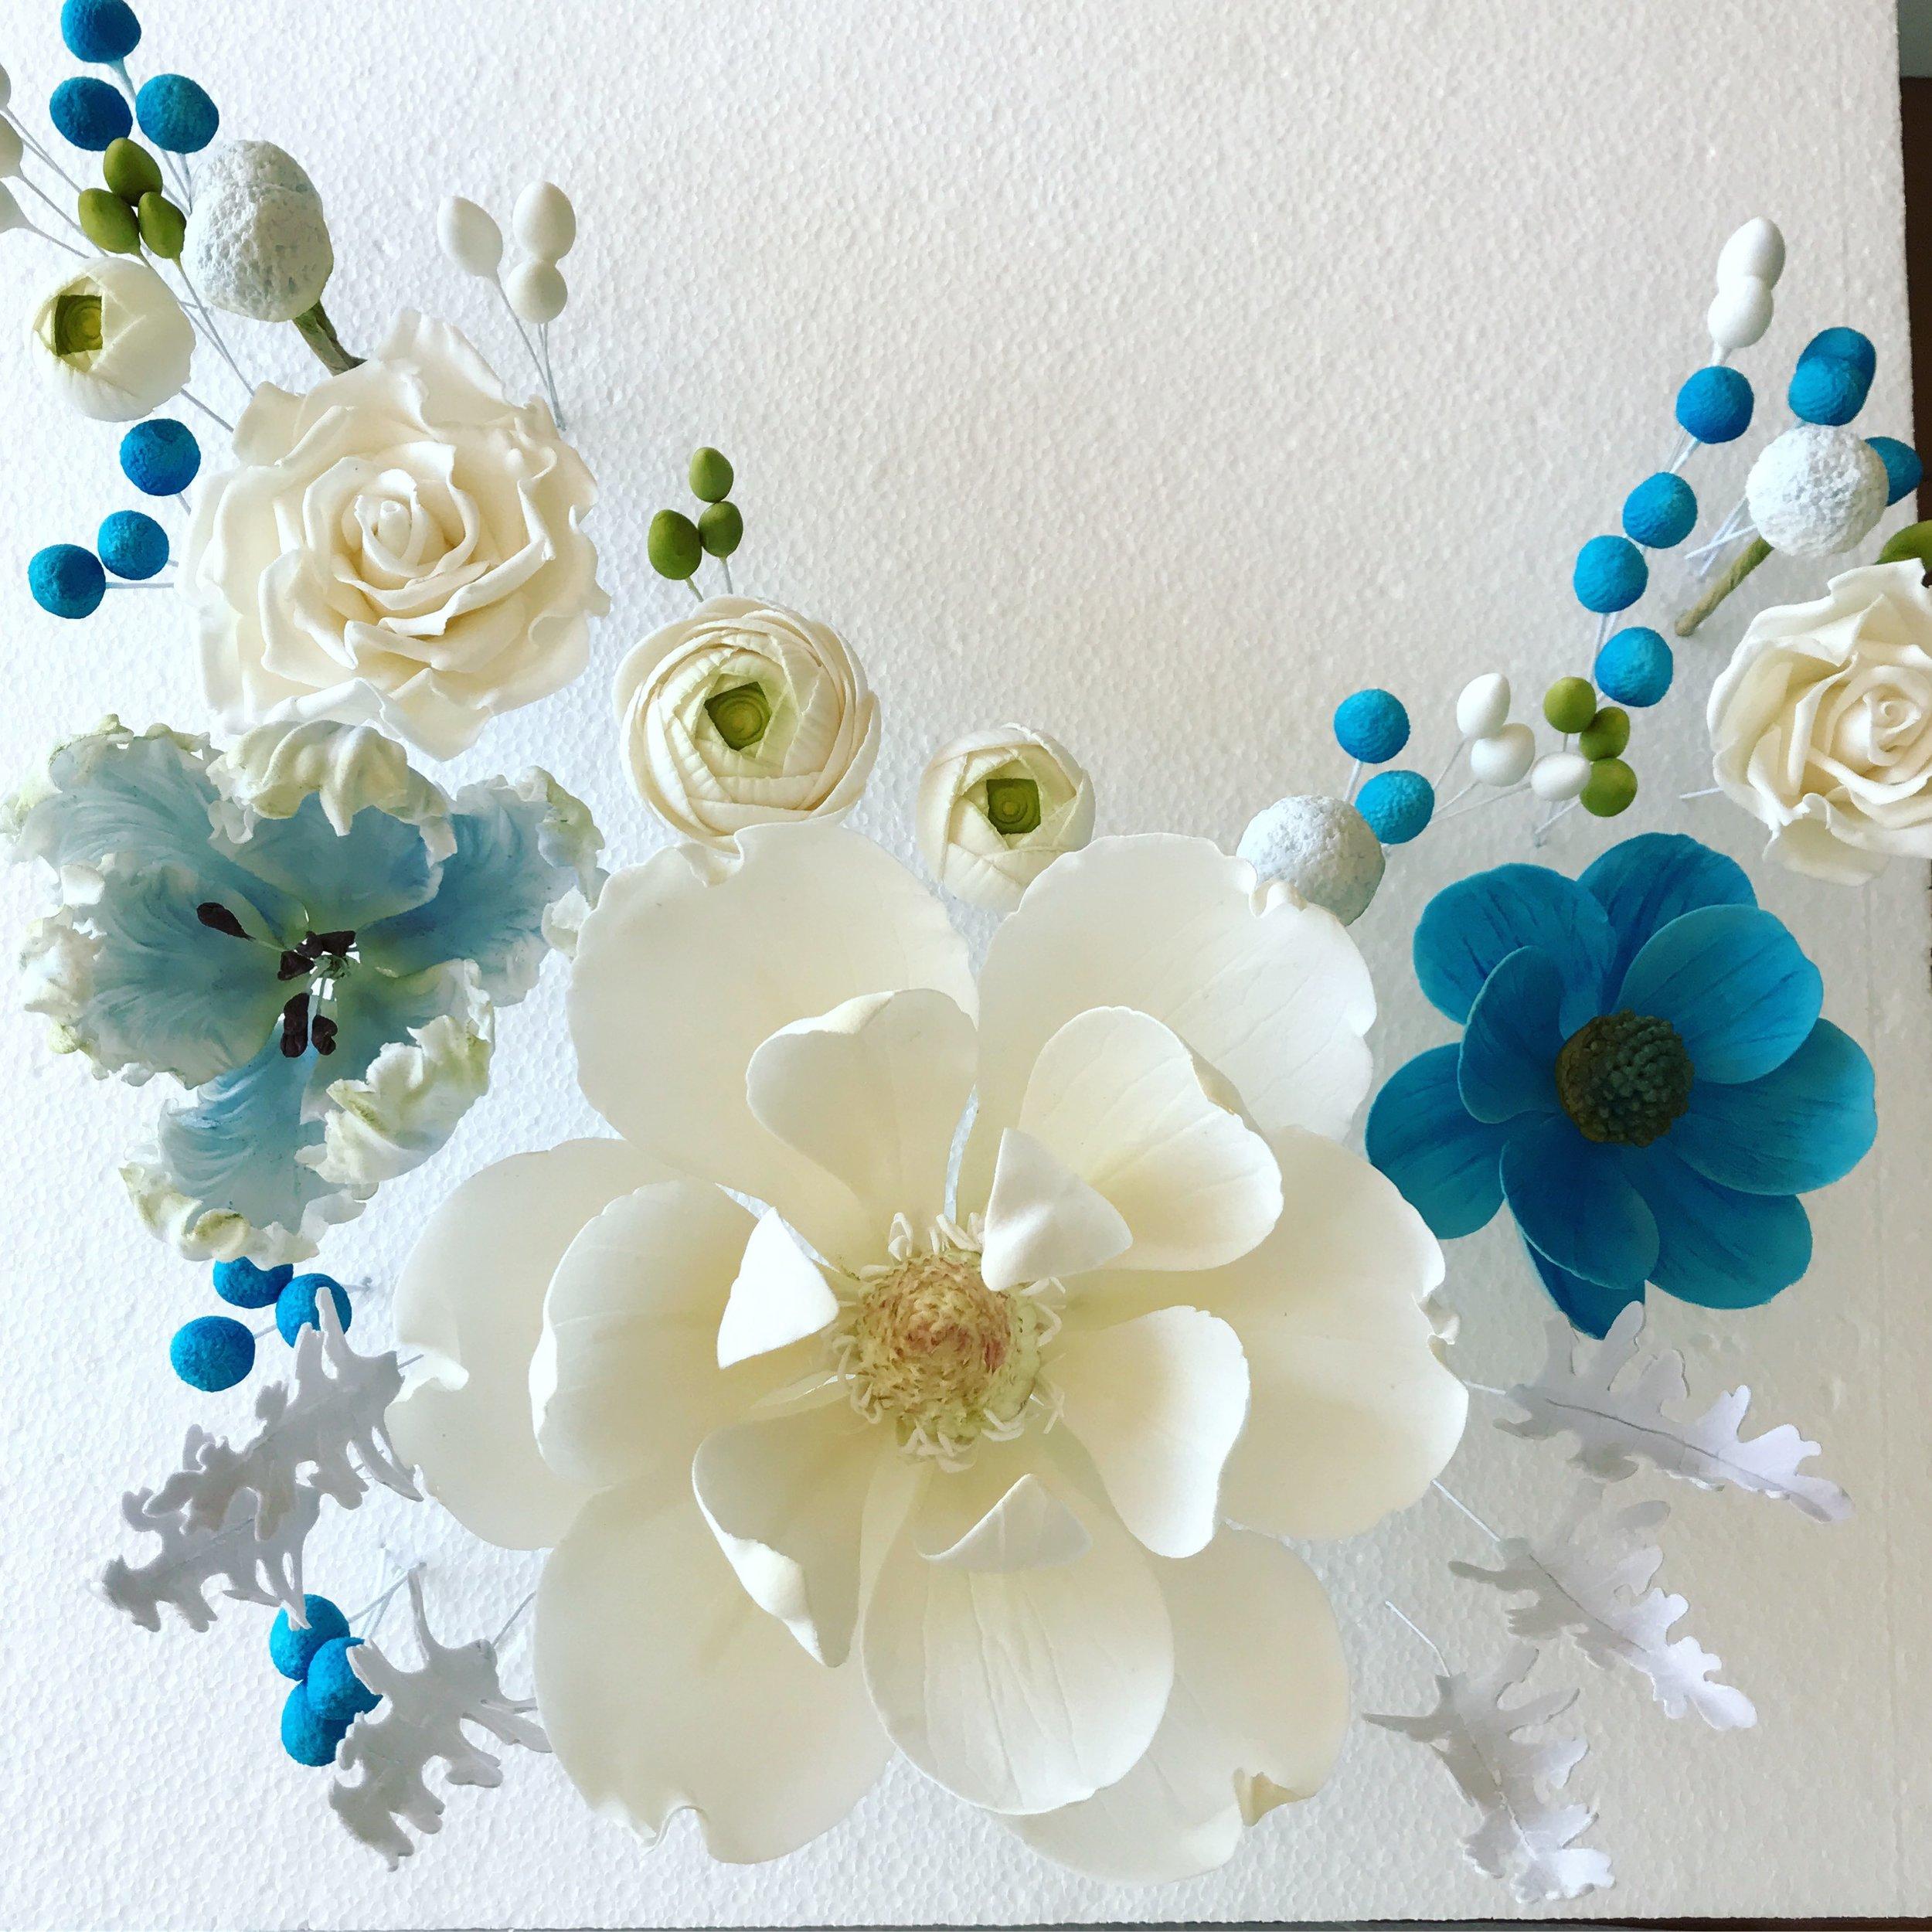 JDA_sugarflowers_blue.JPG